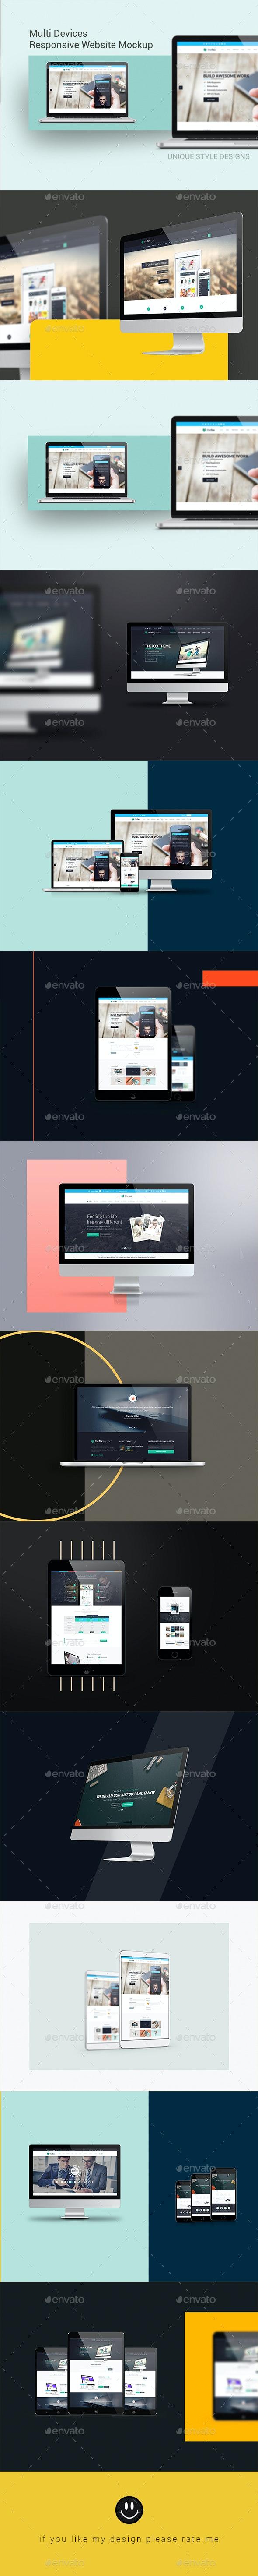 Multi Devices Responsive Website Mockup - Displays Product Mock-Ups